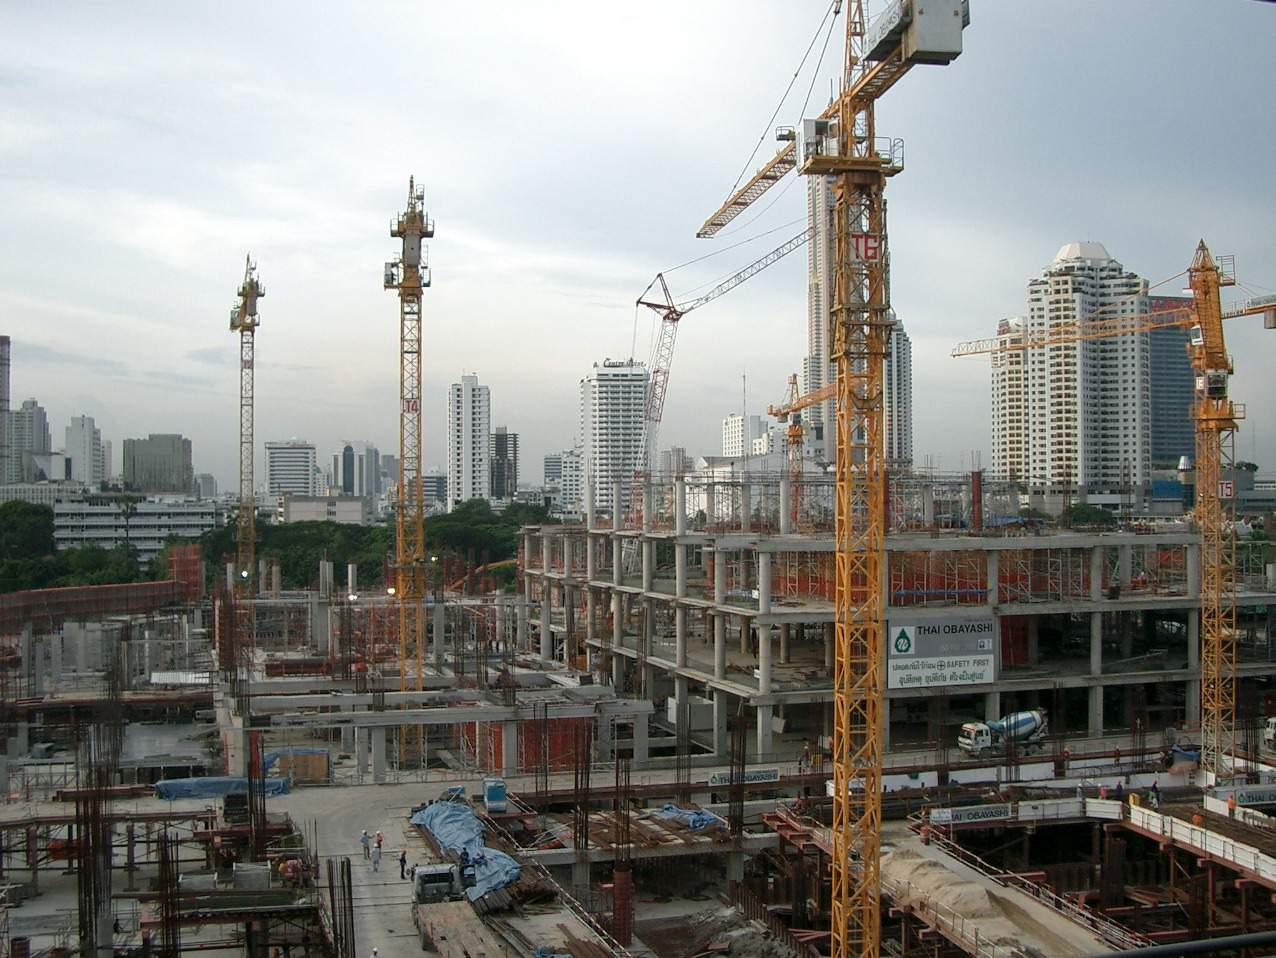 Building site scene concrete pillars cranes steel supports